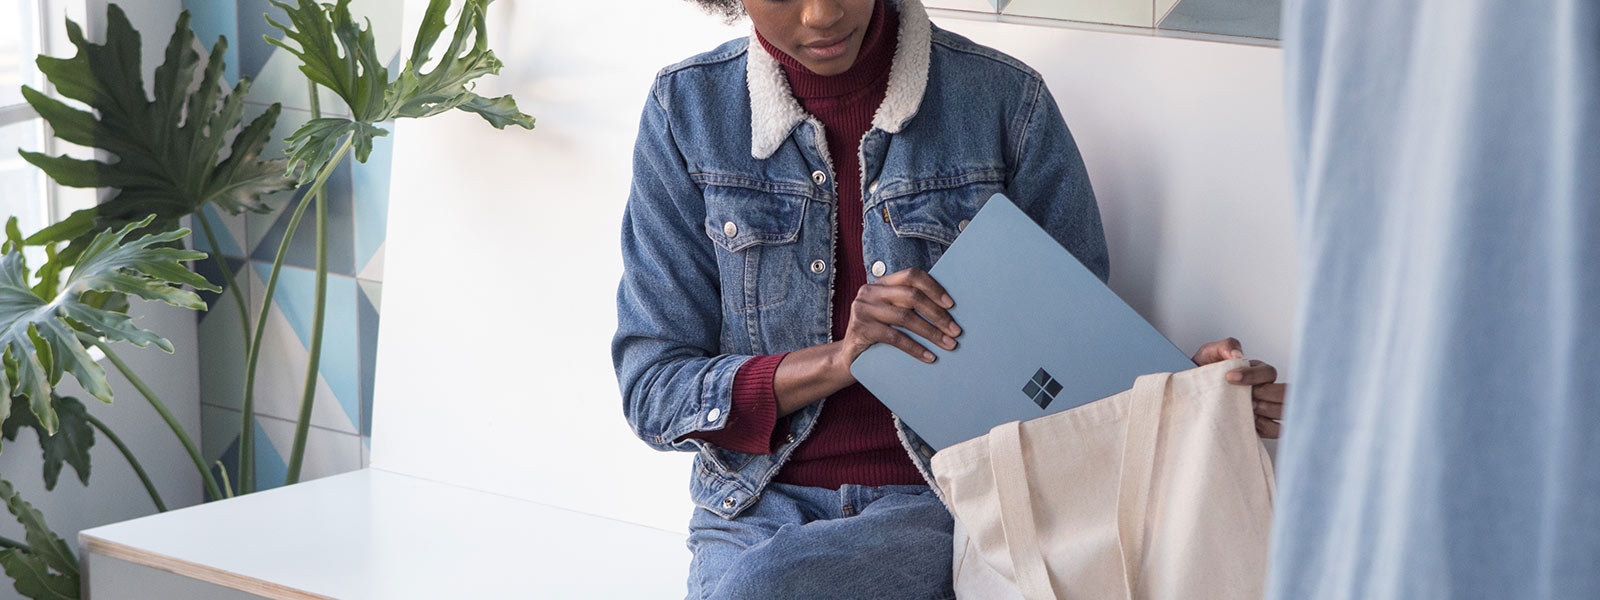 Women placing Surface Laptop in her bag.